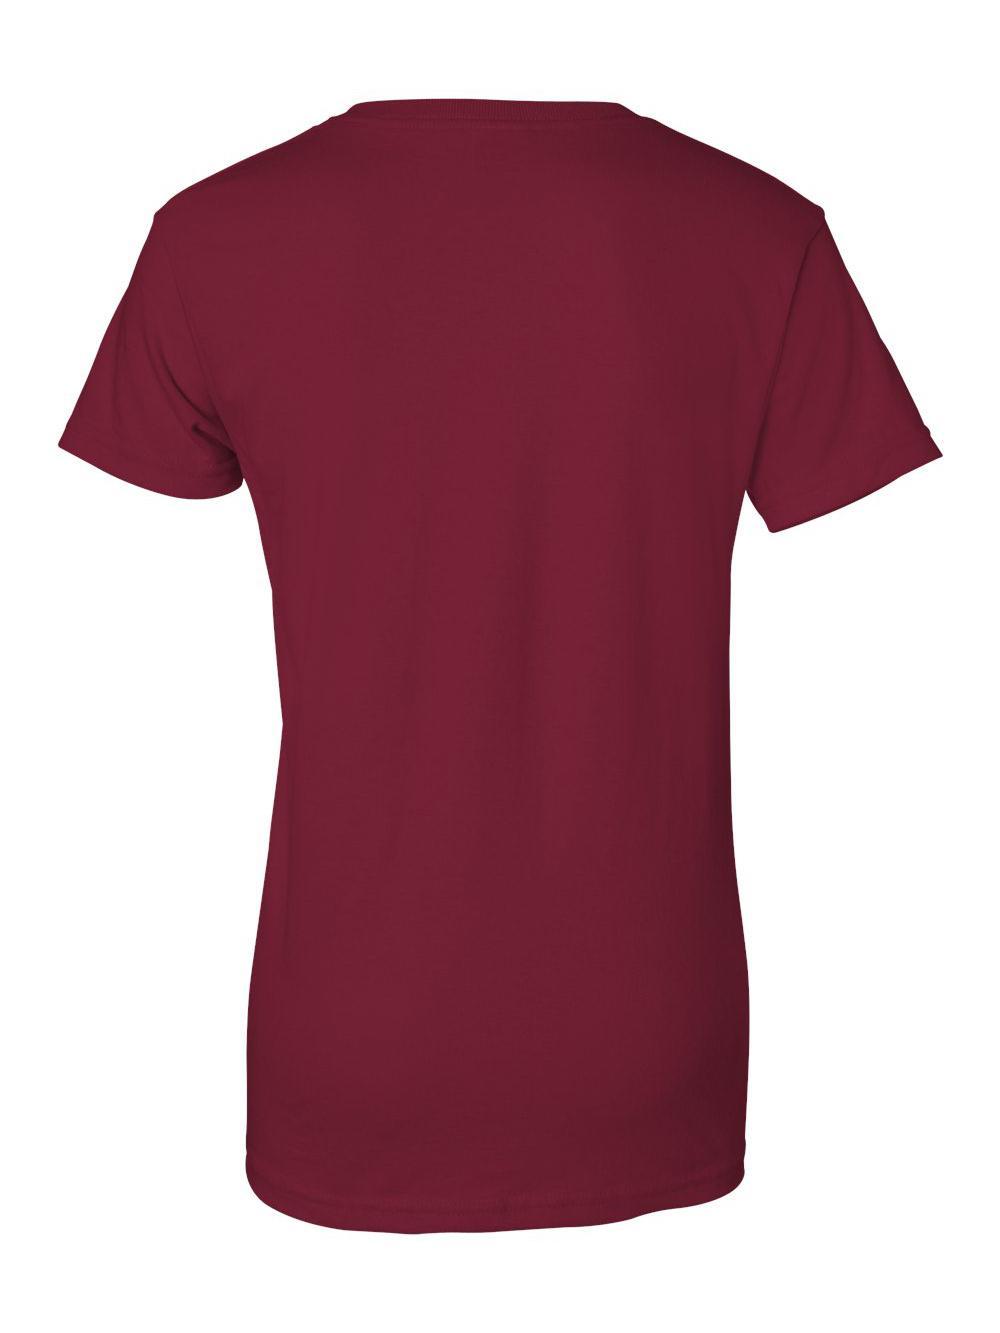 Gildan-Ultra-Cotton-Women-039-s-T-Shirt-2000L thumbnail 7